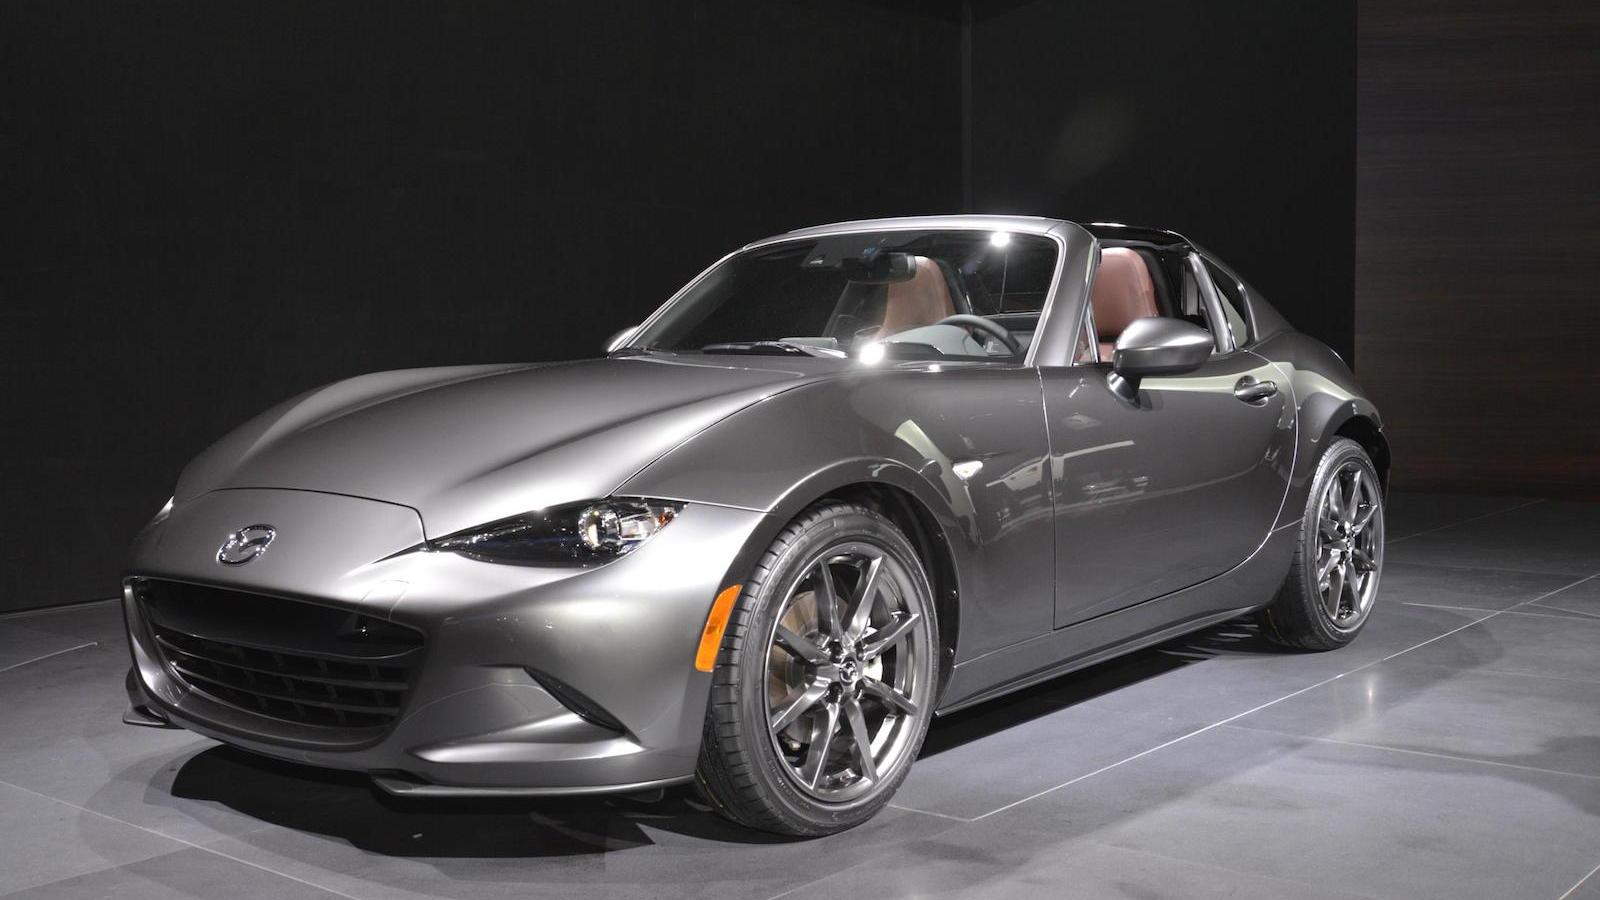 2017 Mazda MX-5 Miata RF, 2016 New York Auto Show